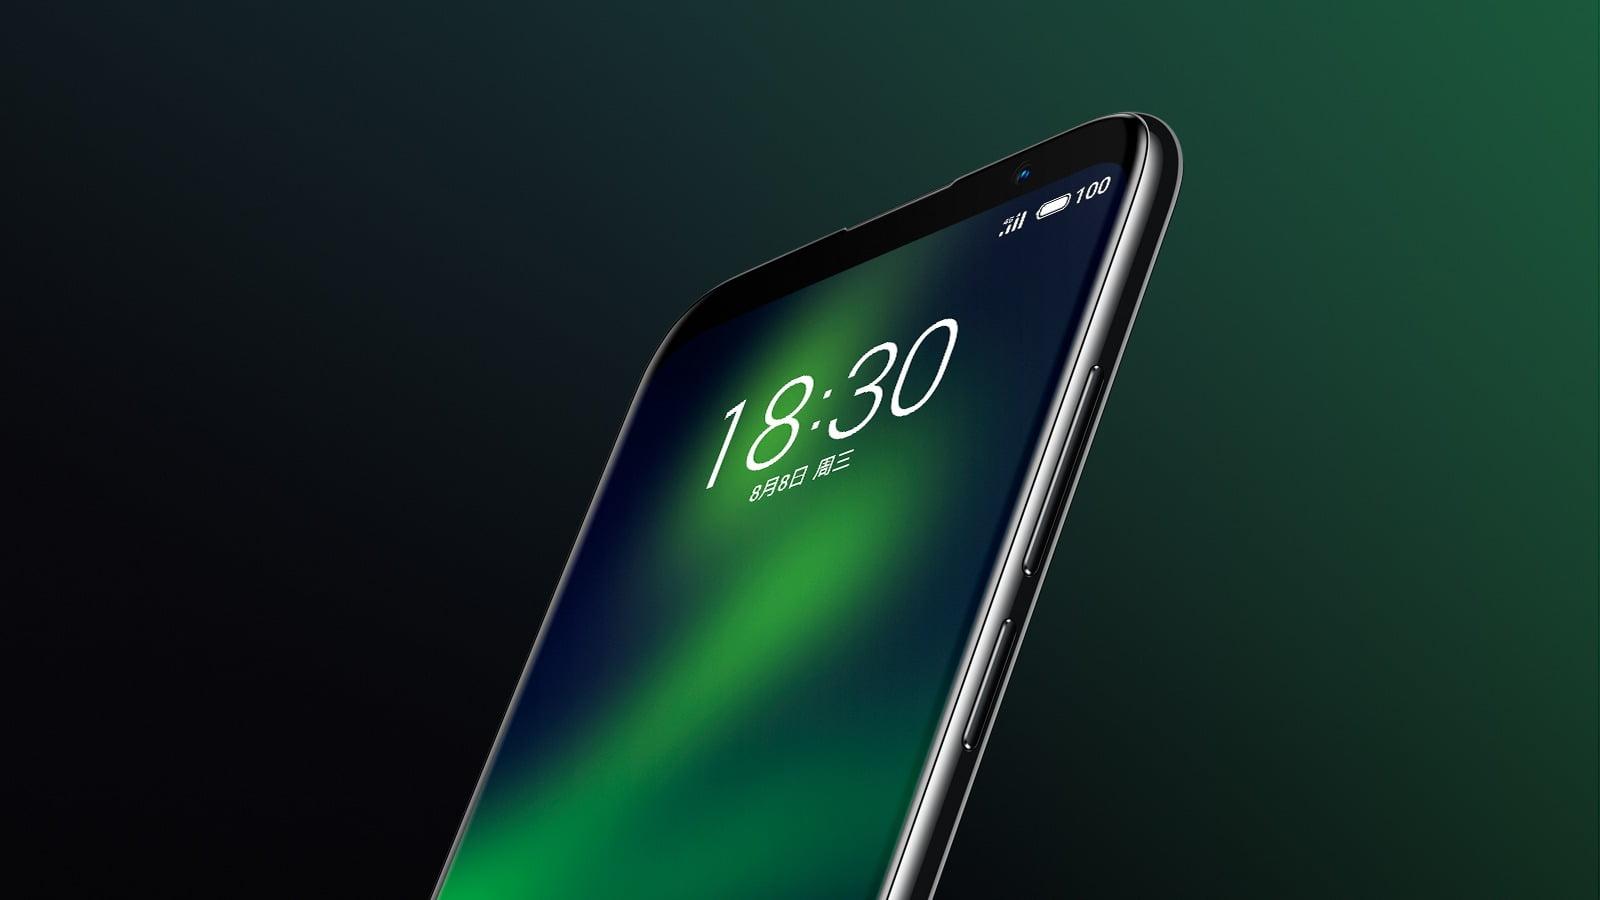 Meizu 16X with Snapdragon 710 visits AnTuTu, scores 164K 1